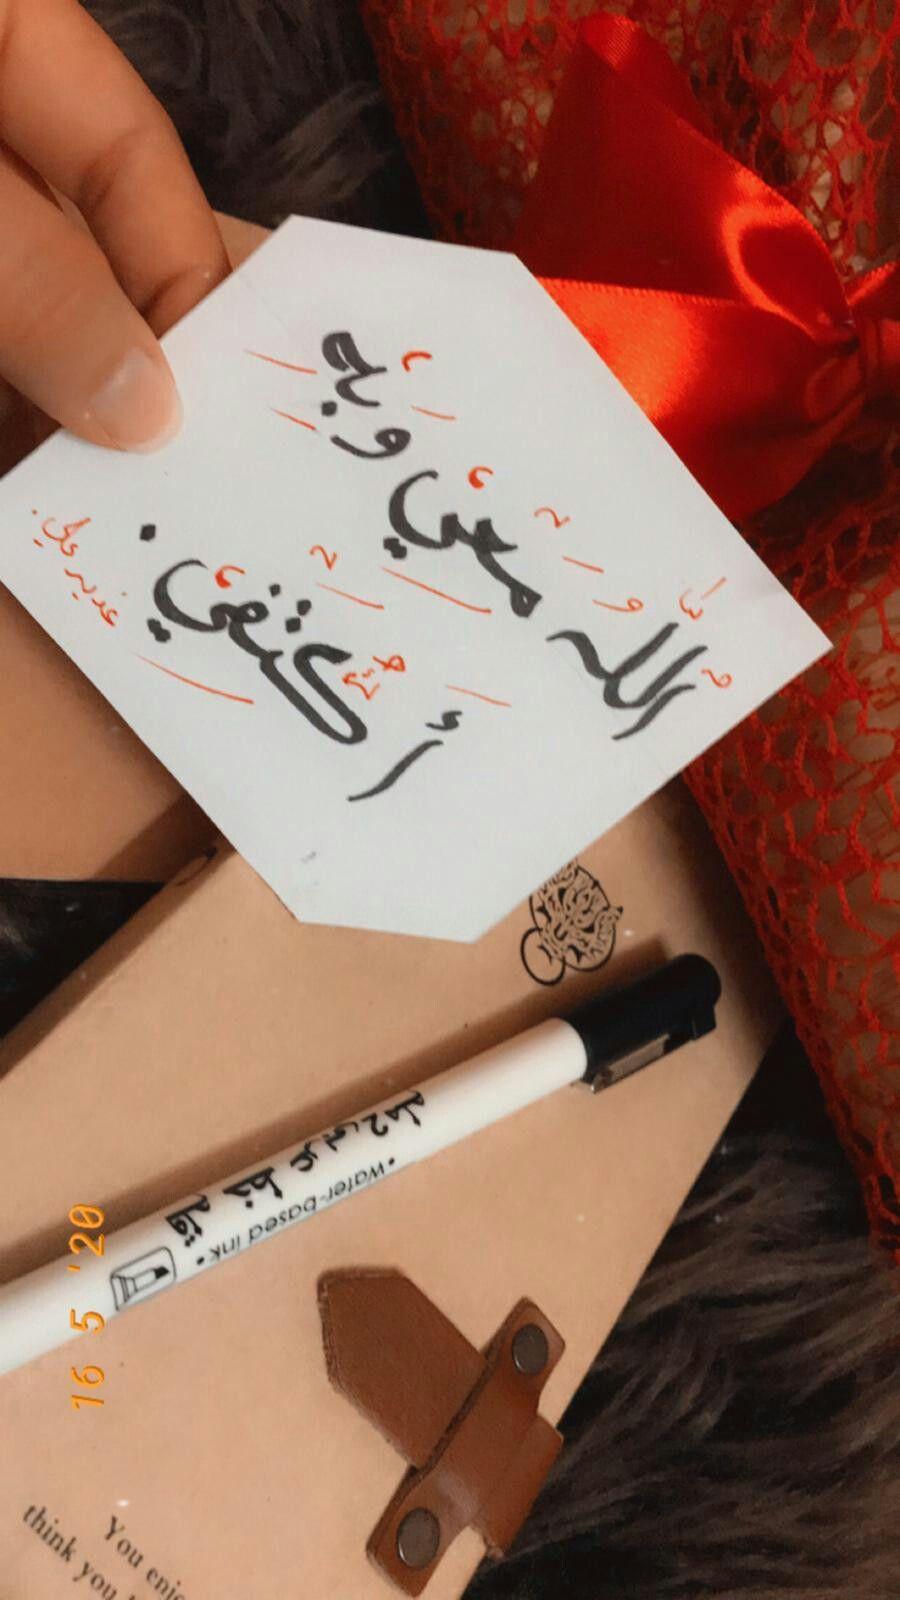 الله معي وبه اكتفي My Drawings Cards Playing Cards